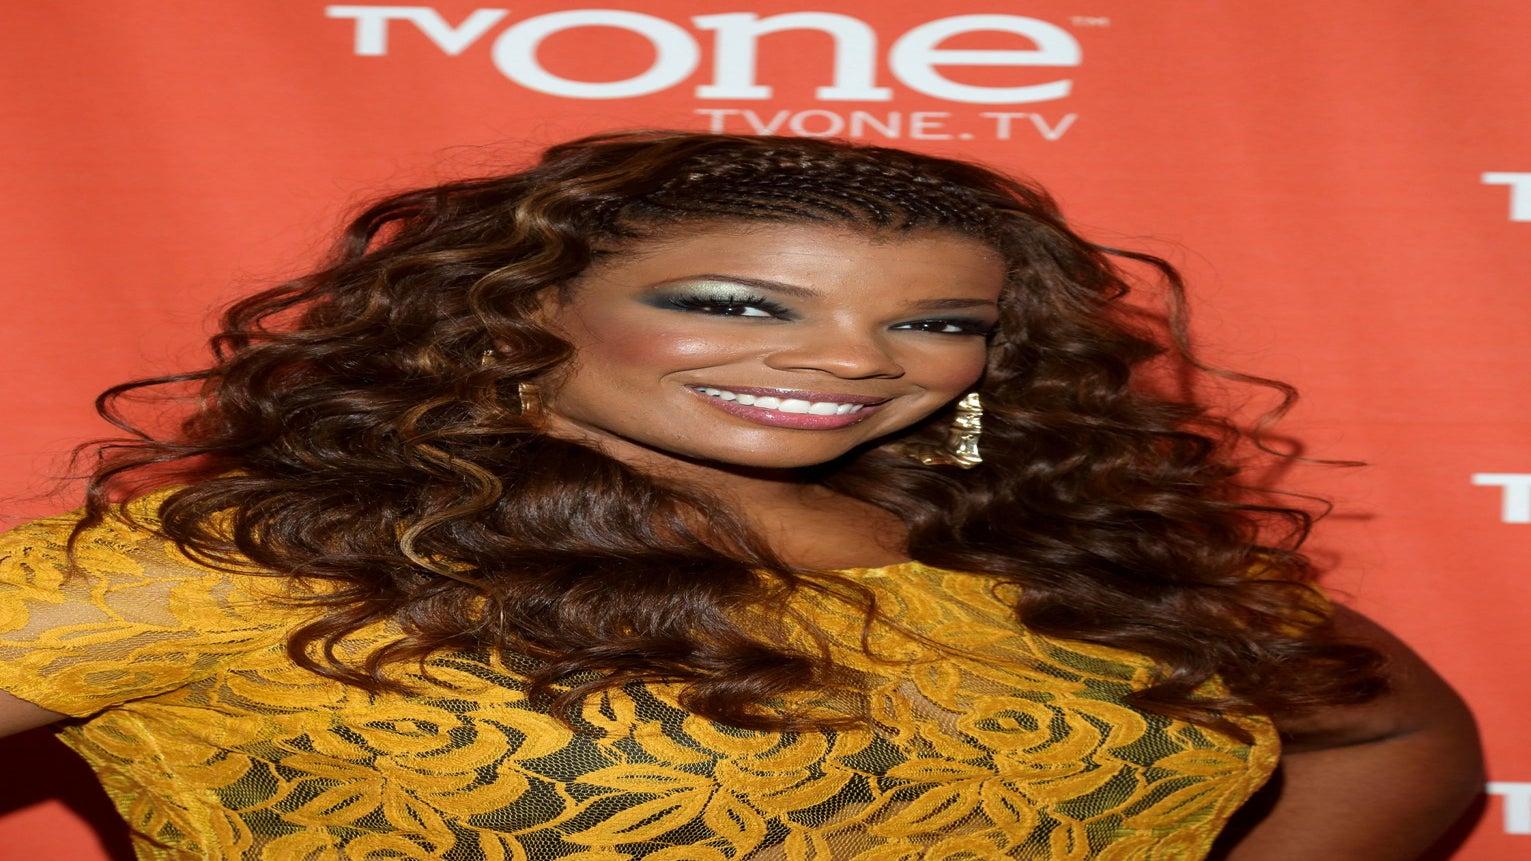 EXCLUSIVE: Syleena Johnson Talks Emotional Appearance on 'Iyanla, Fix My Life'